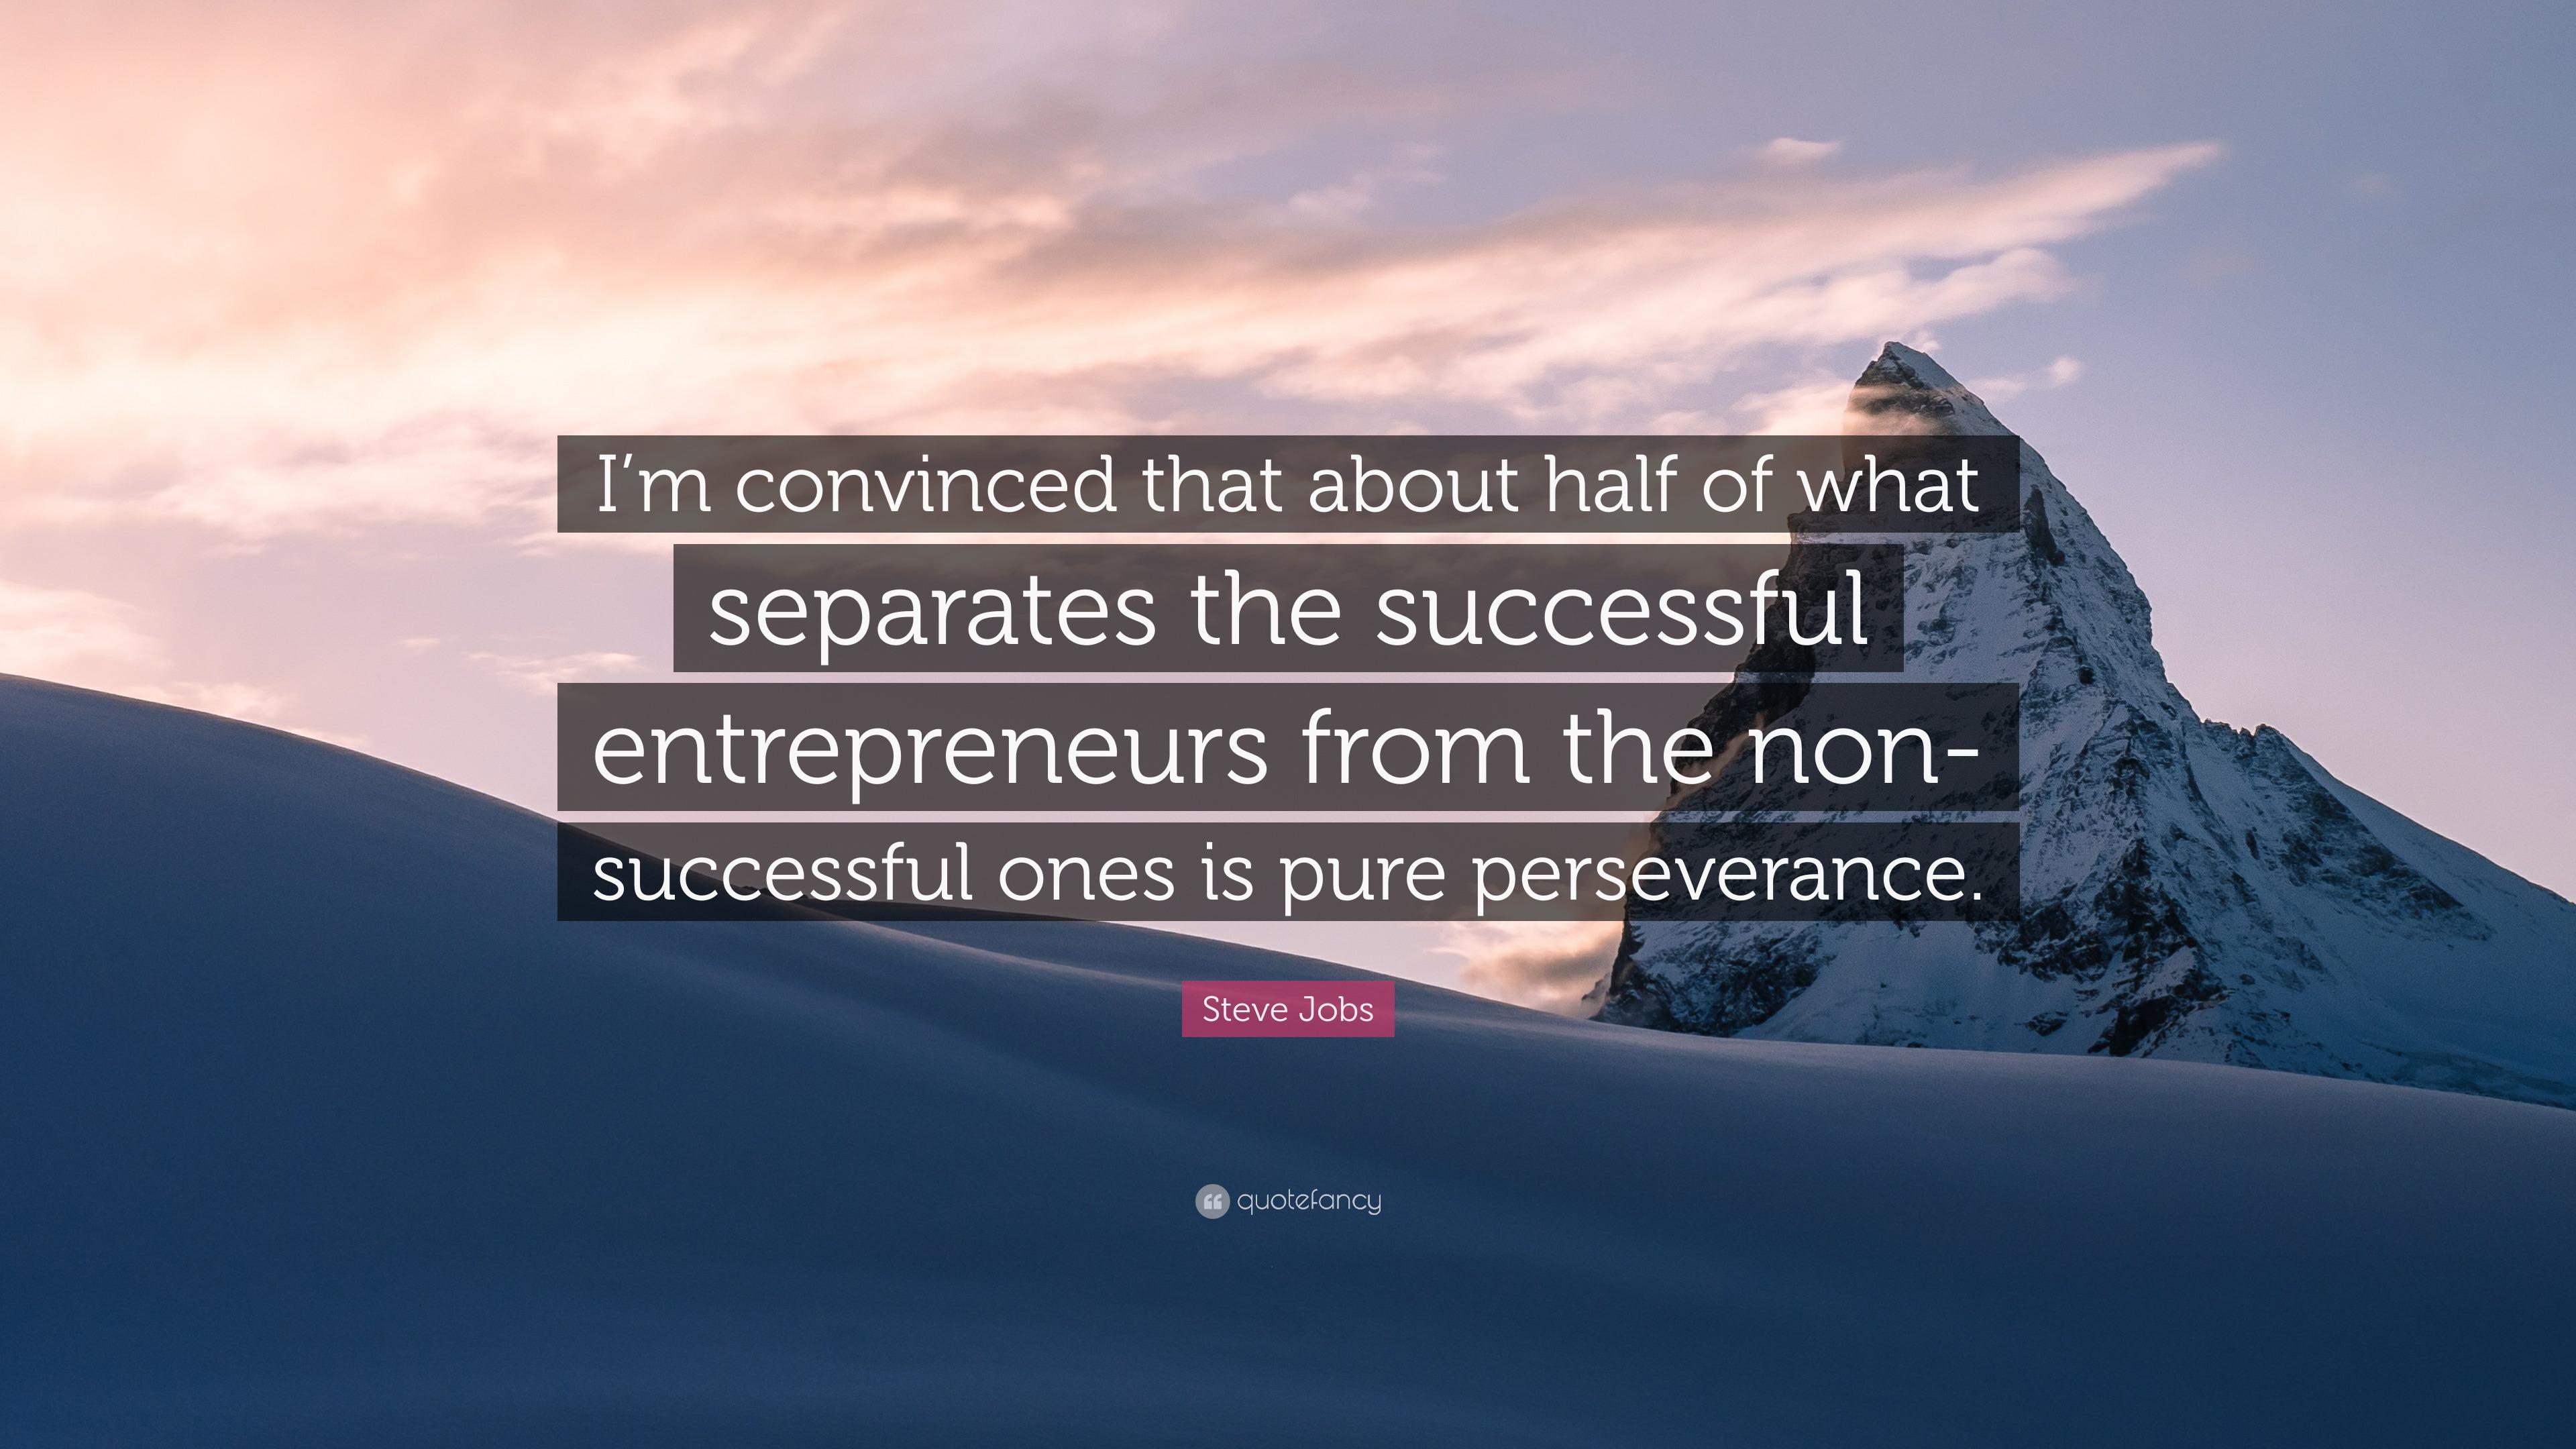 Startup quotes 100 wallpapers quotefancy - Entrepreneur wallpaper ...